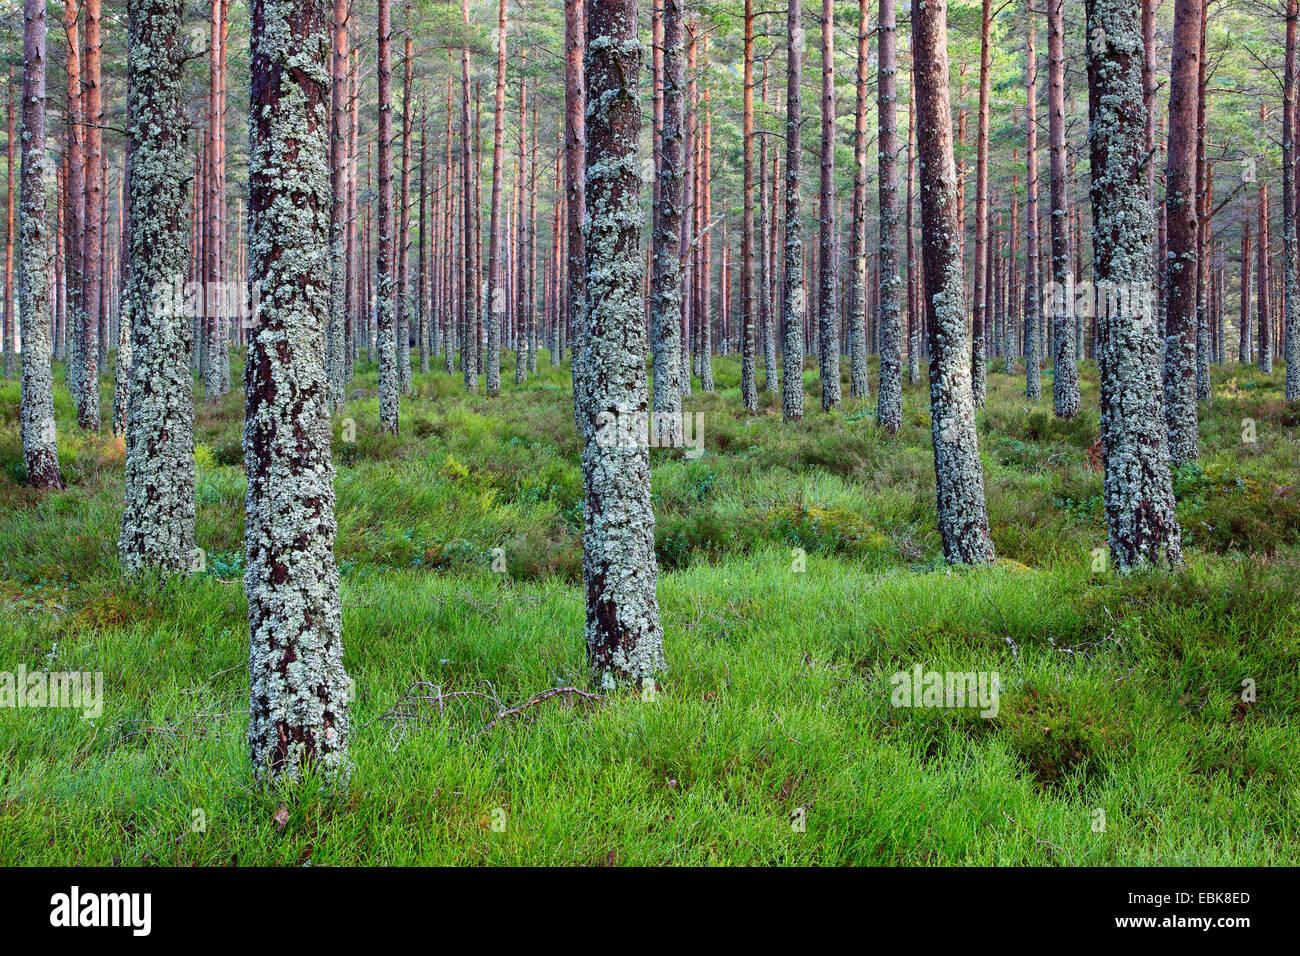 Scotch pine, scots pine (Pinus sylvestris), pine forest, United Kingdom, Scotland, Cairngorms National Park - Stock Image